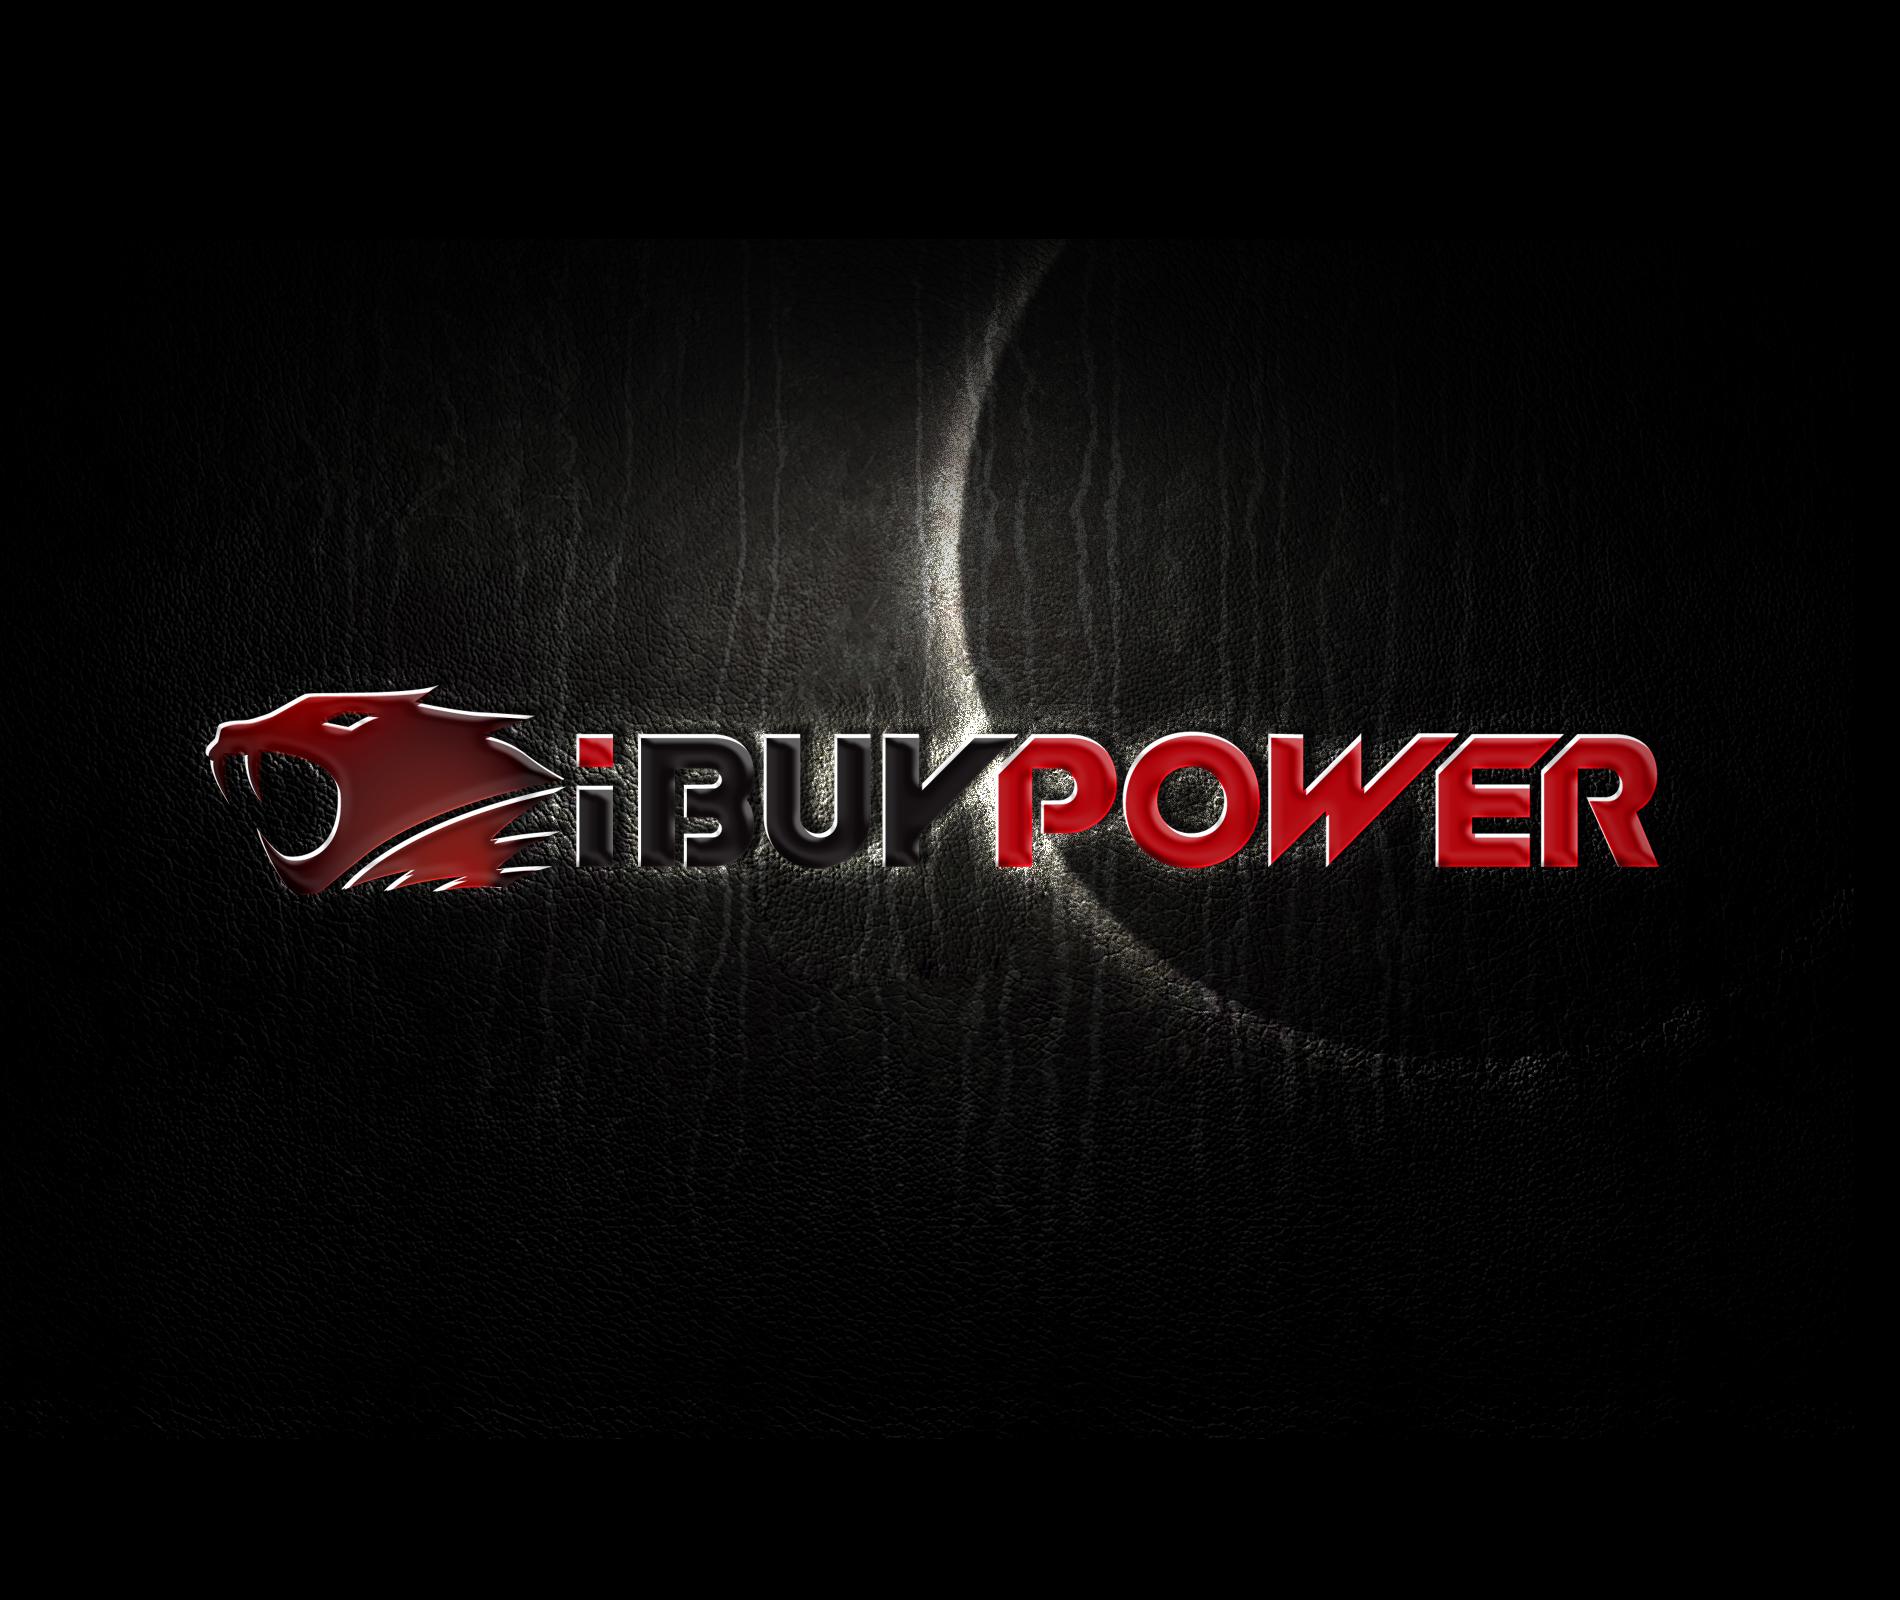 1900x1600 > Ibuypower Wallpapers